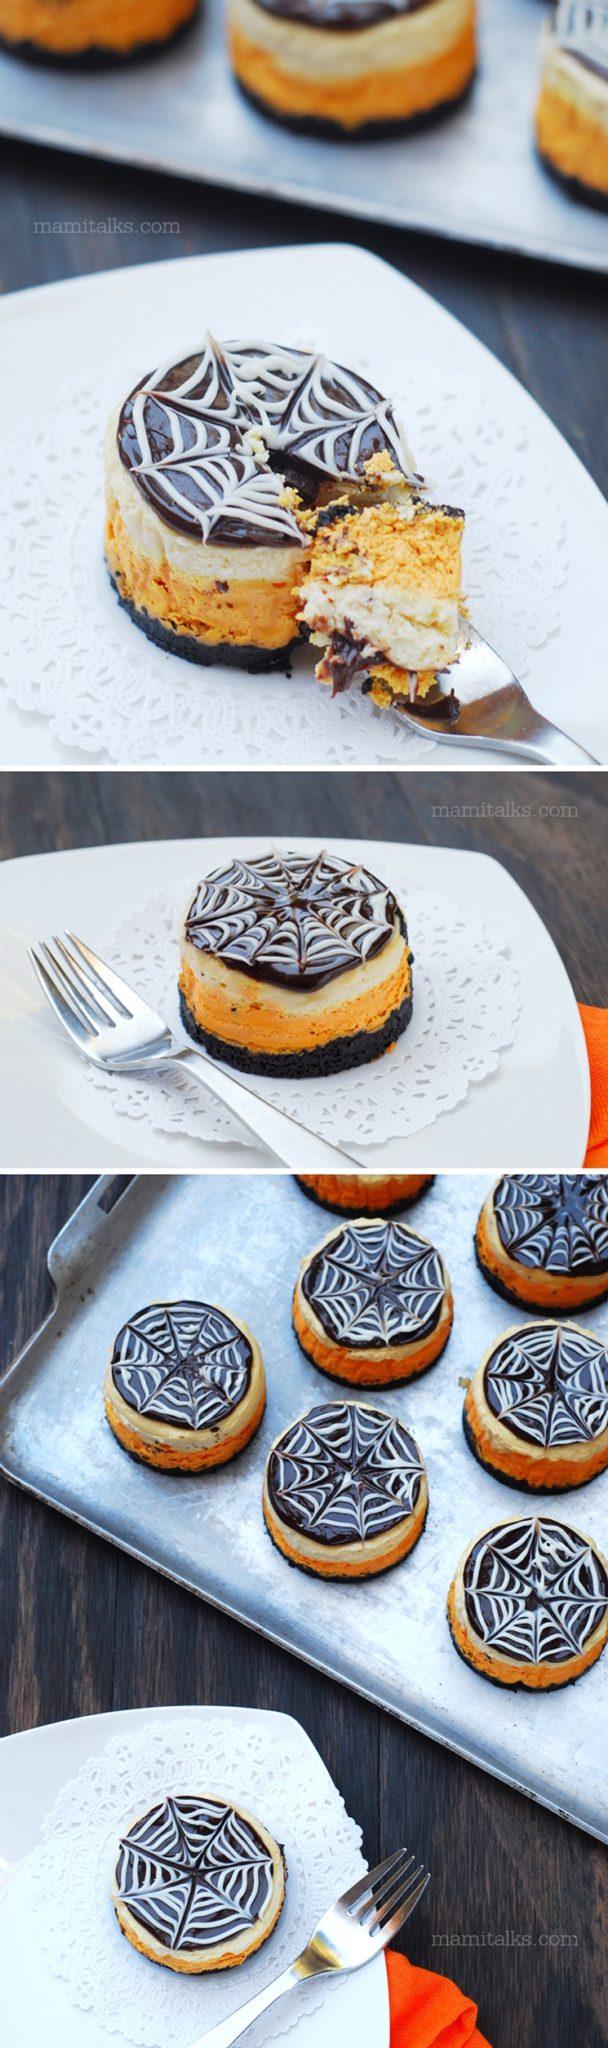 Halloween Mini Cheesecakes with spider webs -MamiTalks.com